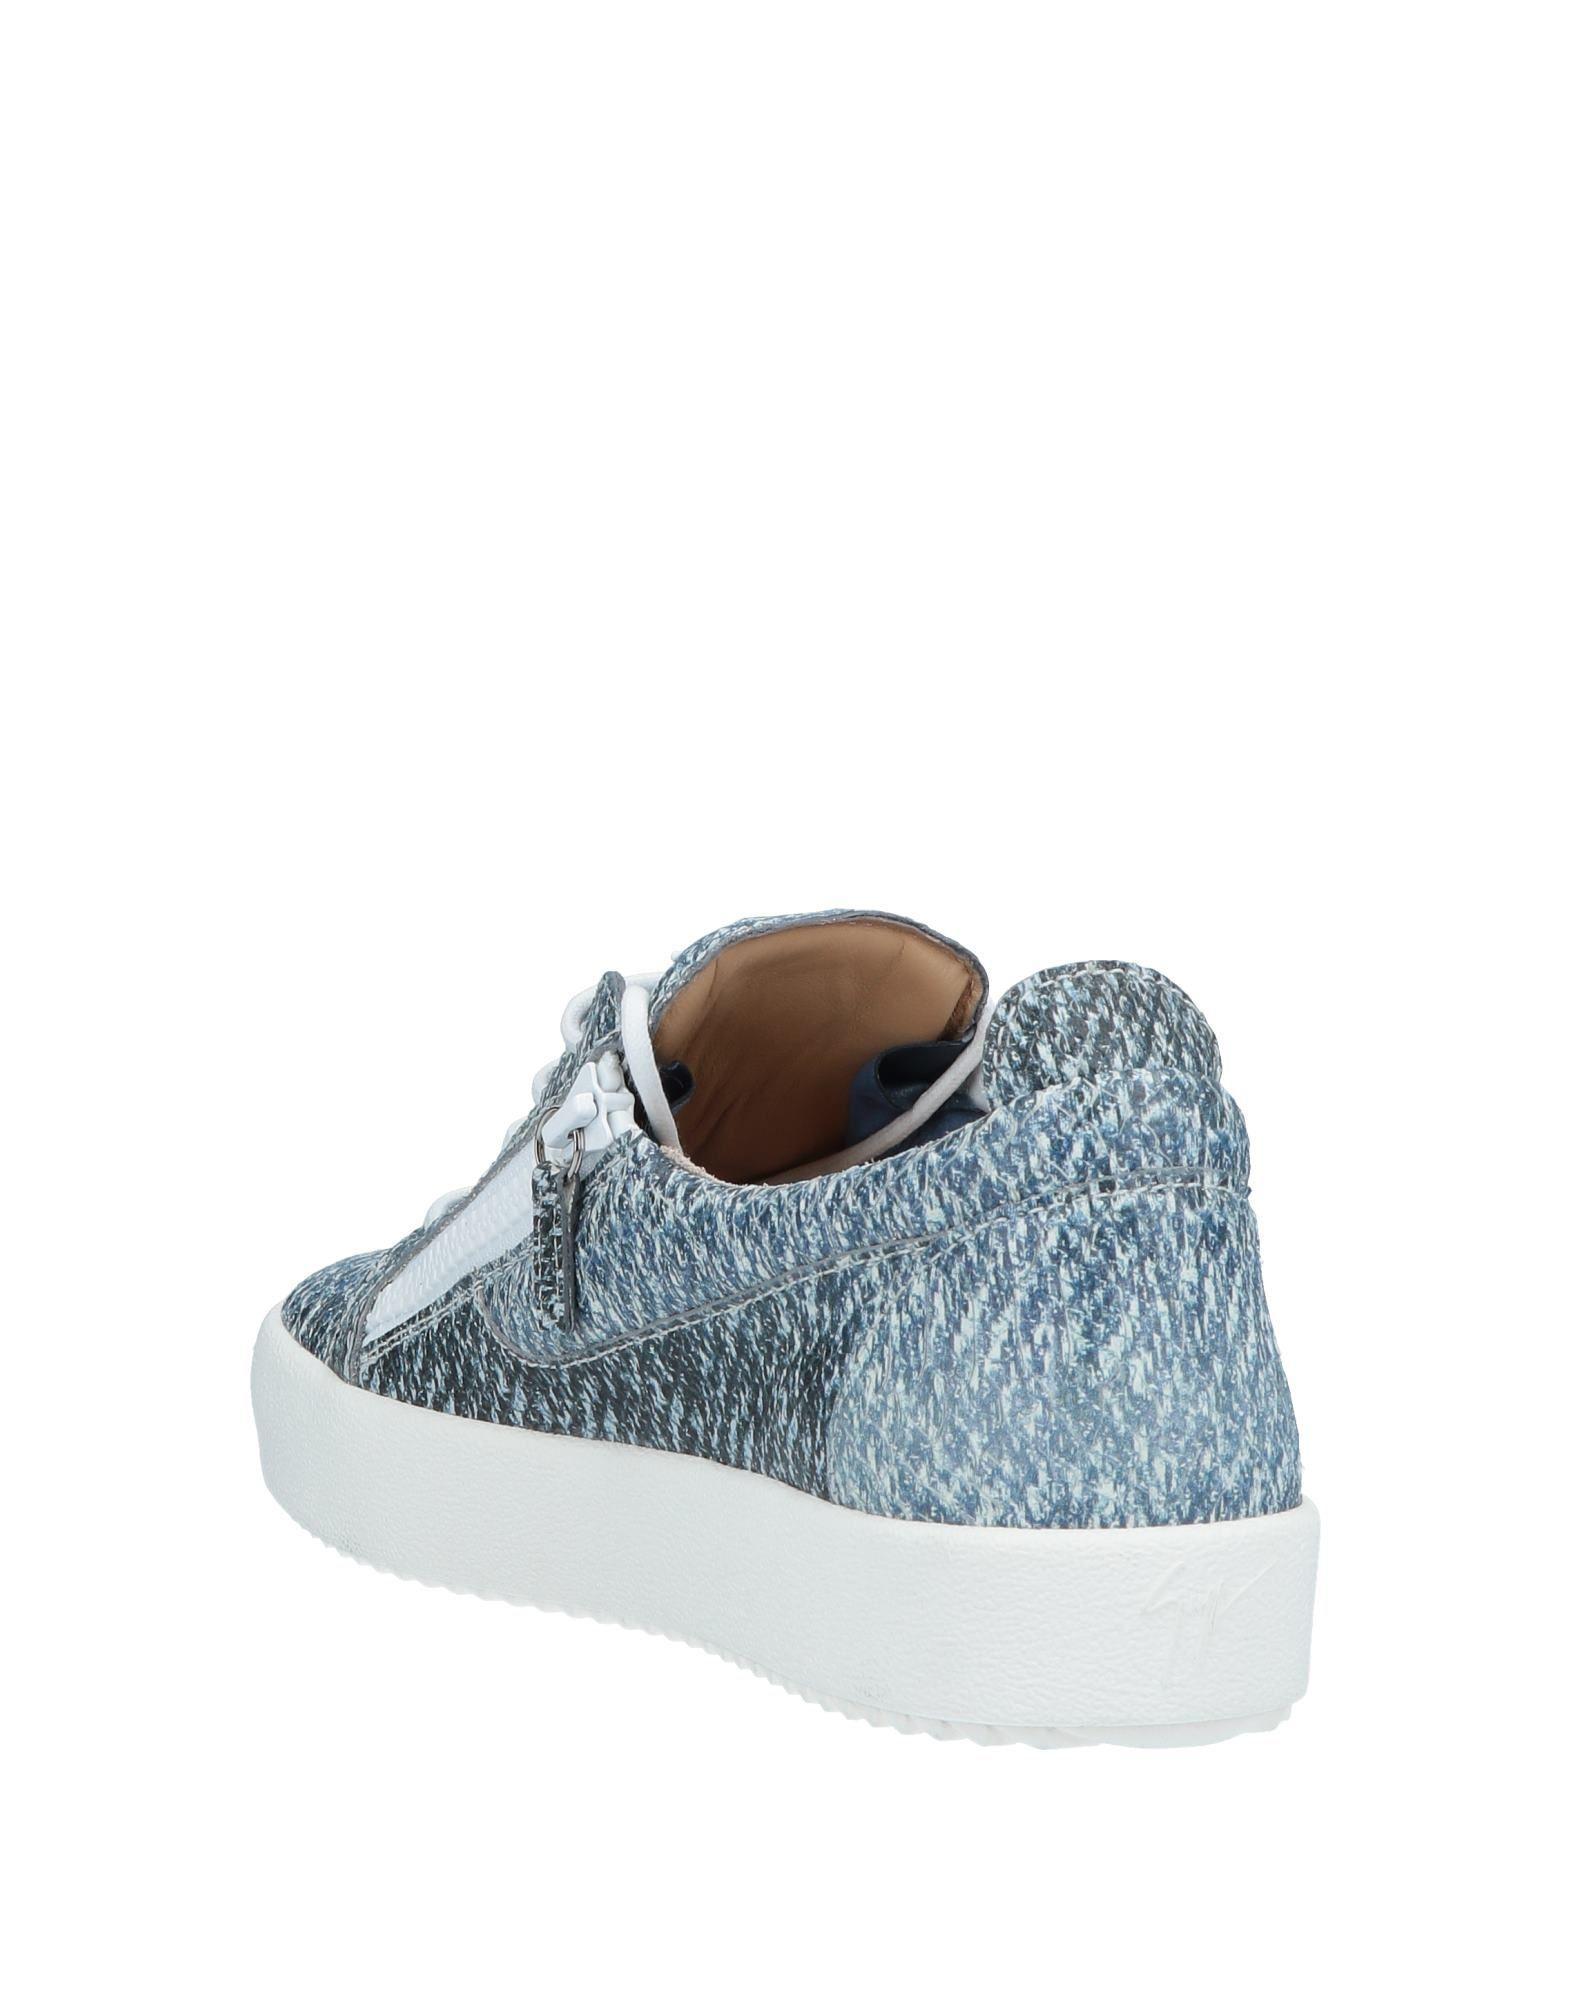 0e37f74720a Lyst - Giuseppe Zanotti Low-tops   Sneakers in Blue for Men